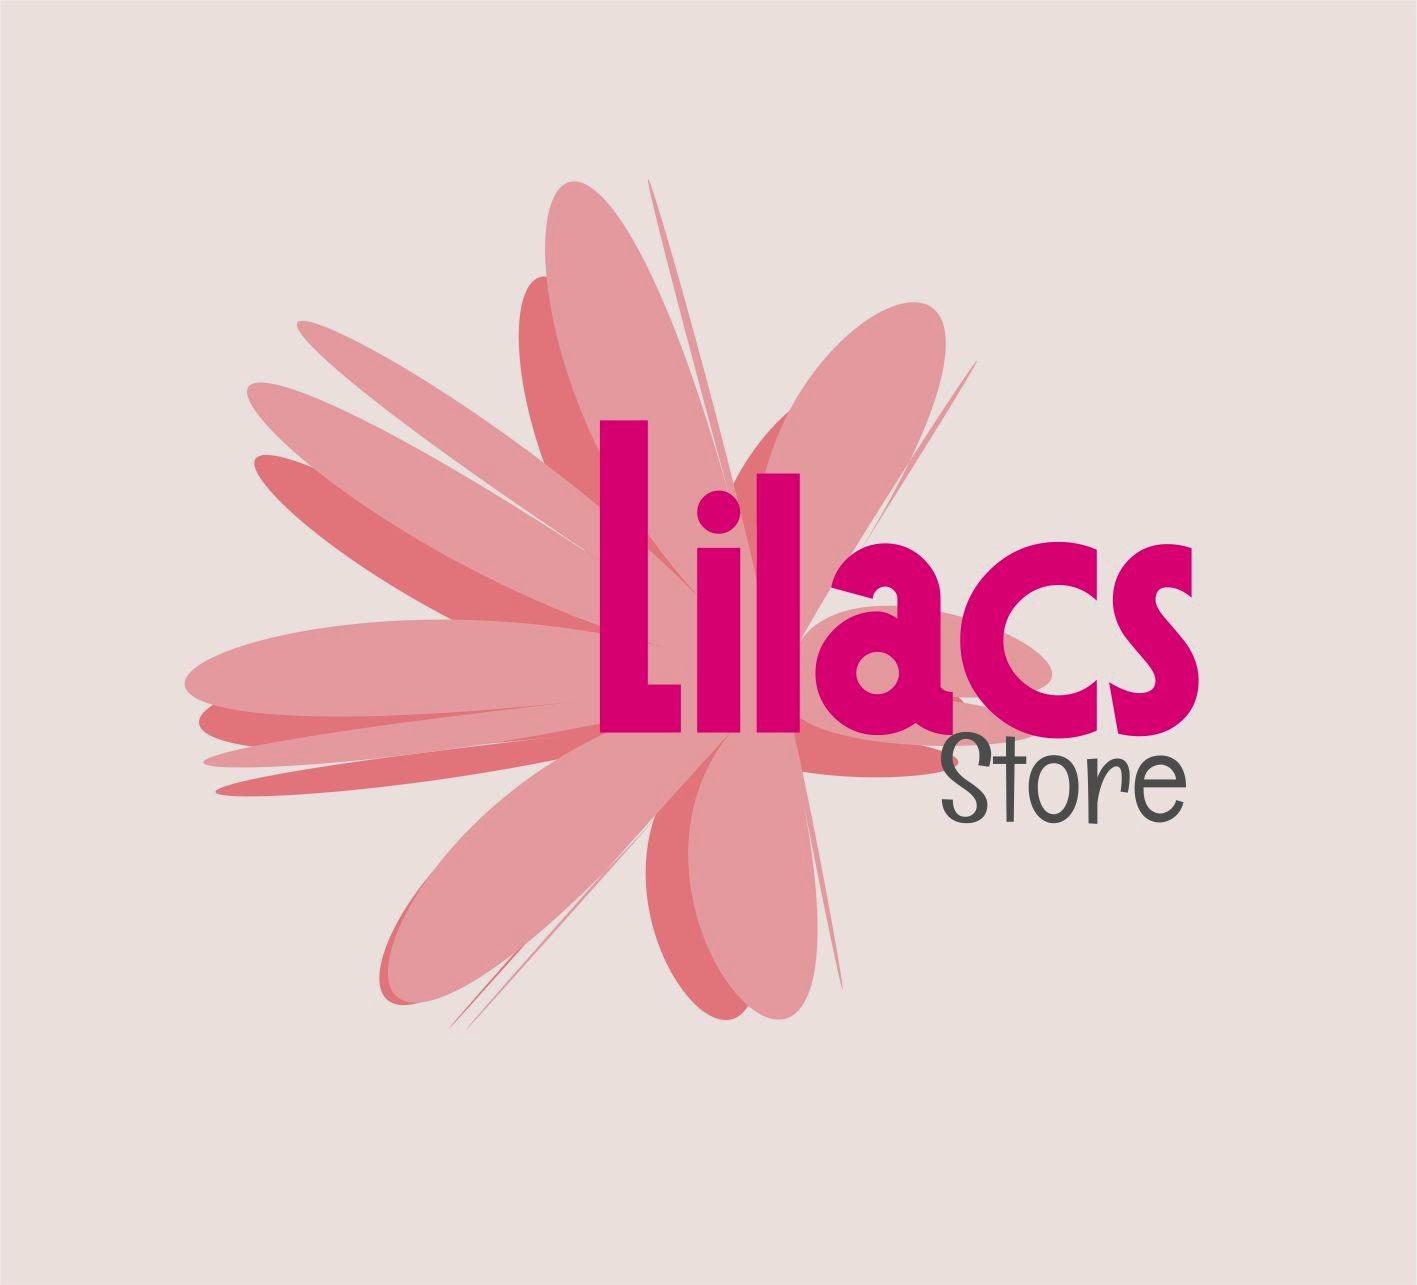 Lilacs_Store